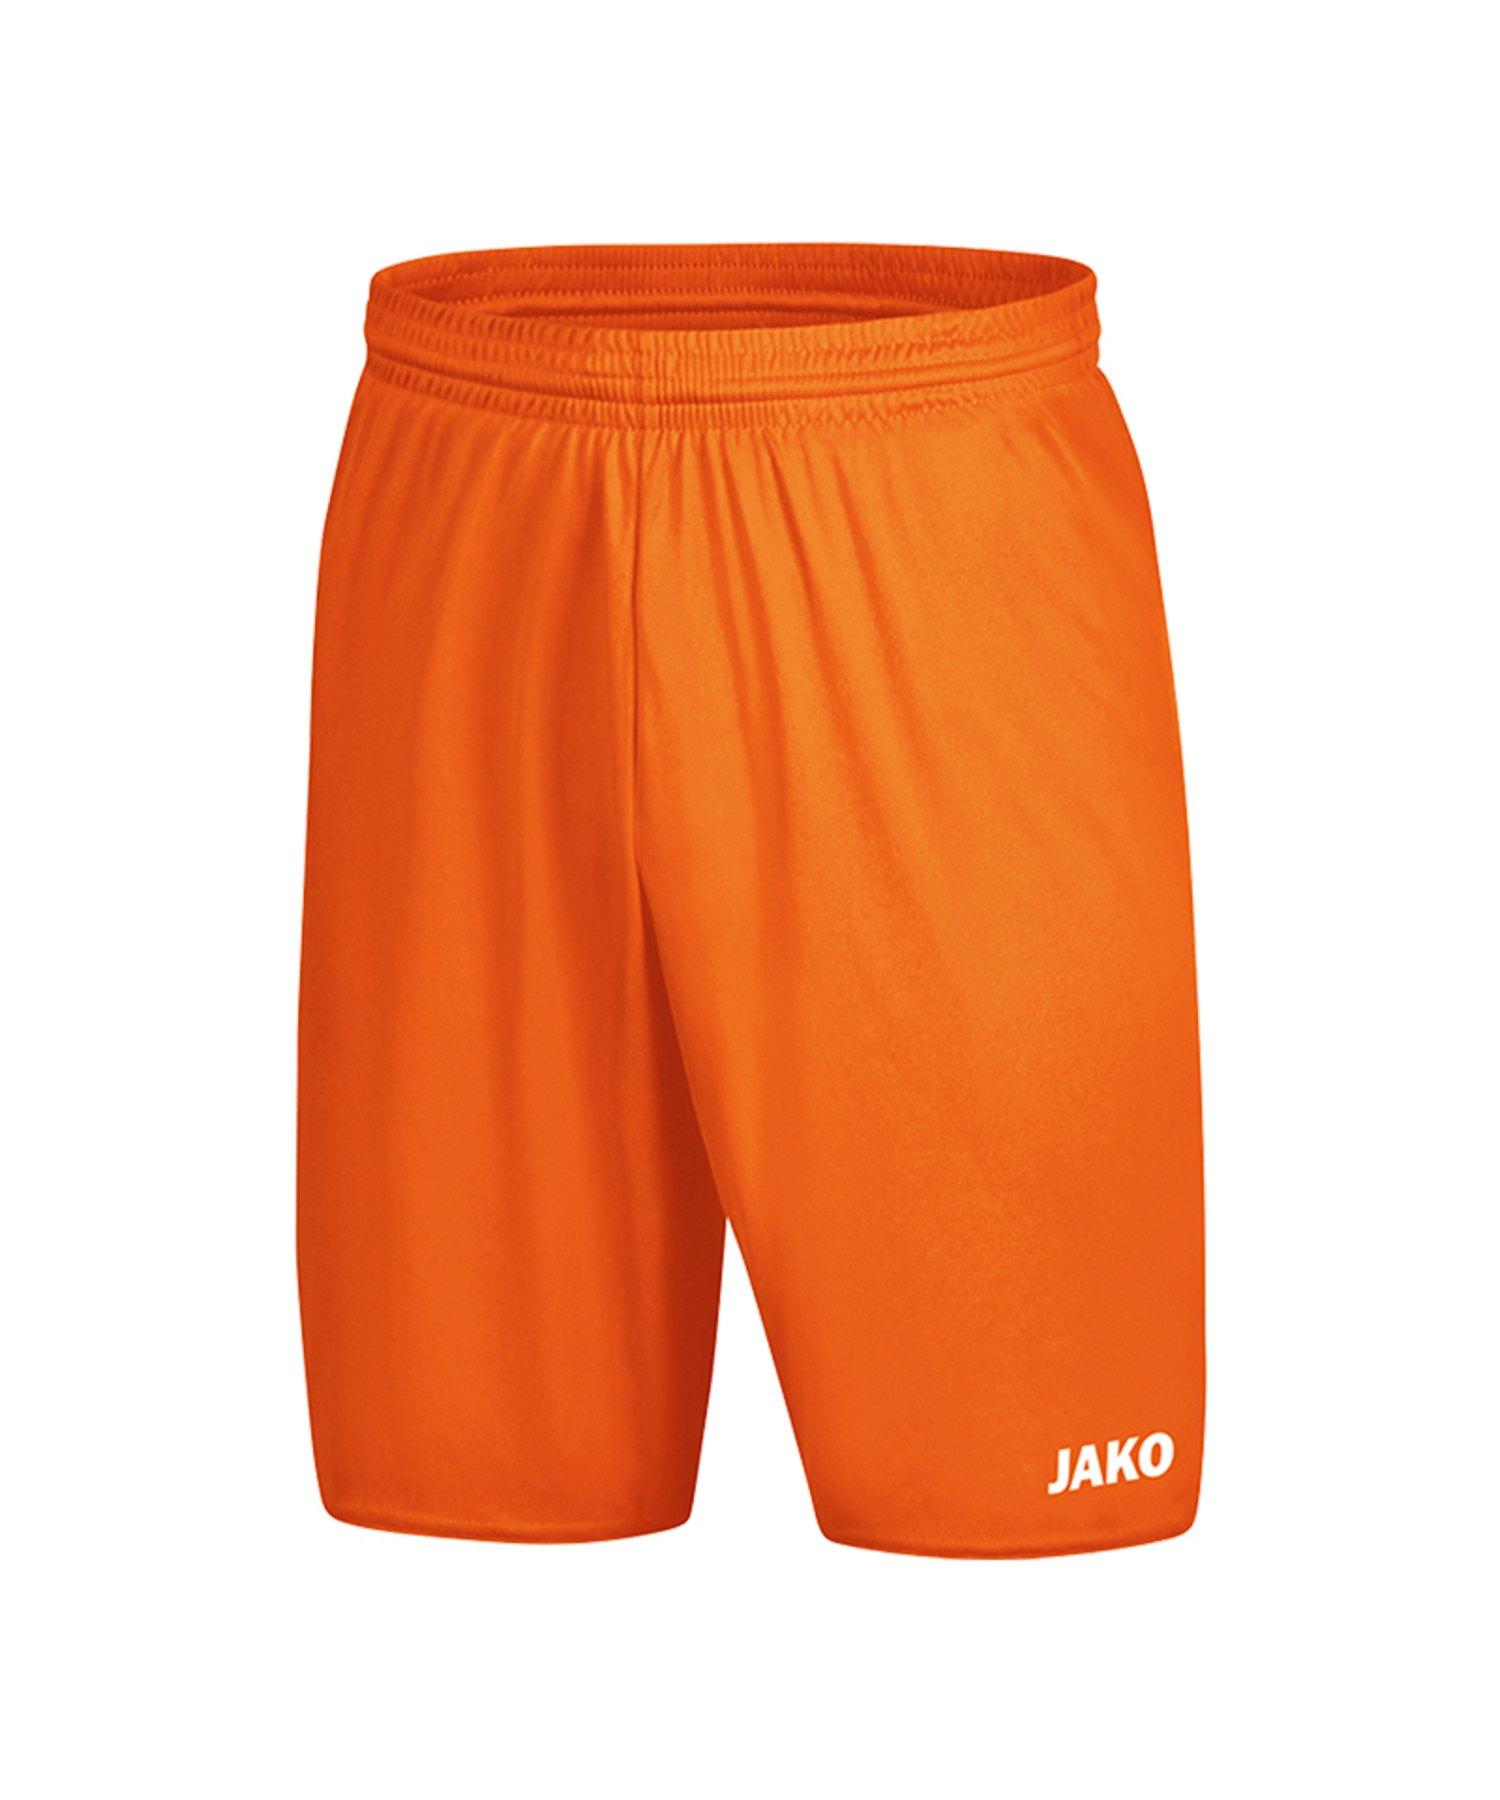 Jako Manchester 2.0 Short ohne Innenslip F19 - Orange